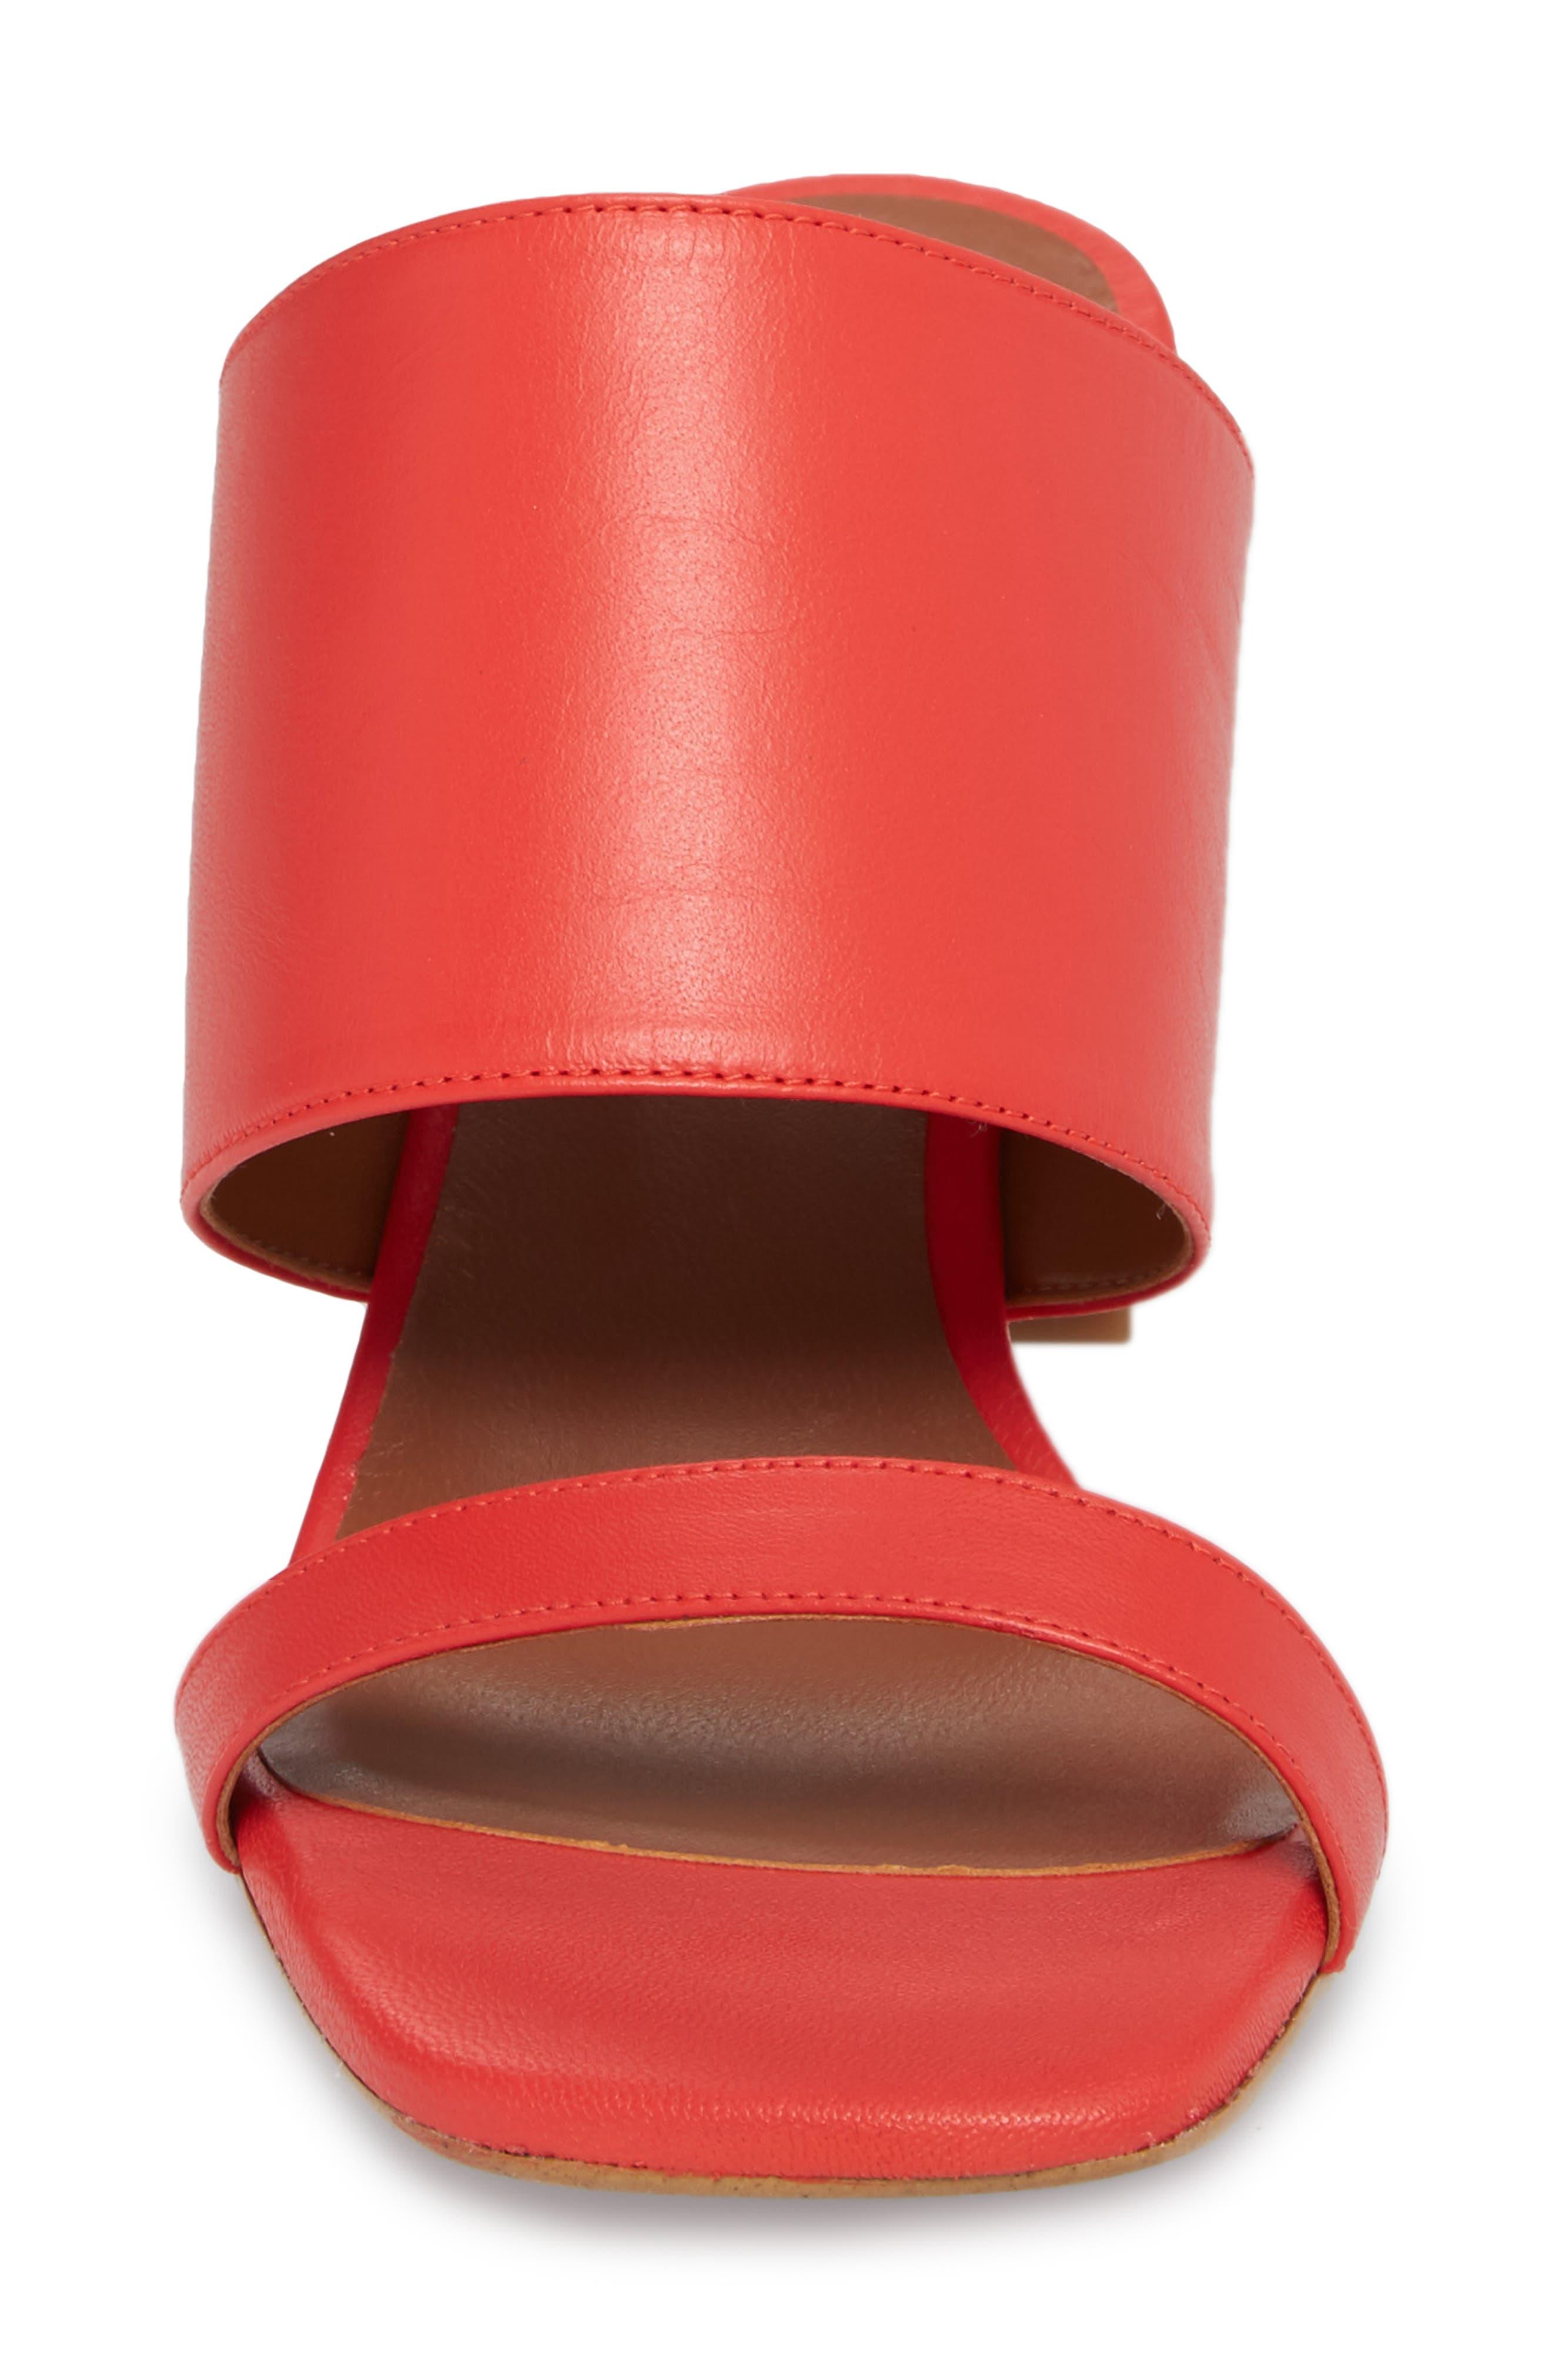 Nickle Mule Sandal,                             Alternate thumbnail 4, color,                             Red